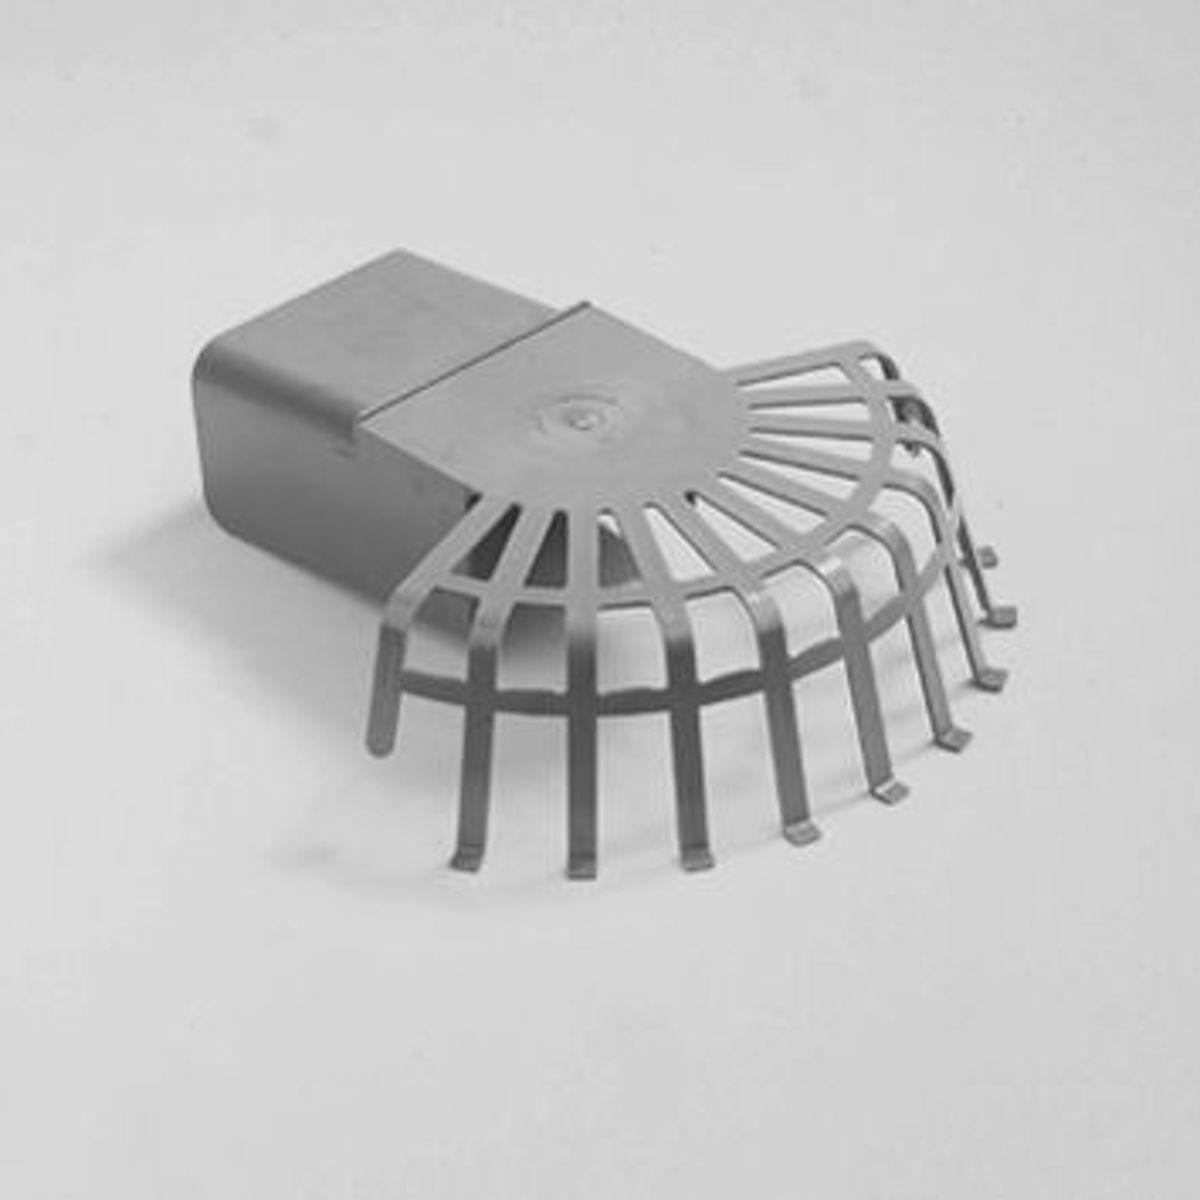 Dyka Bladvanger PVC grijs 60 x 80mm (Prijs per stuk) kopen